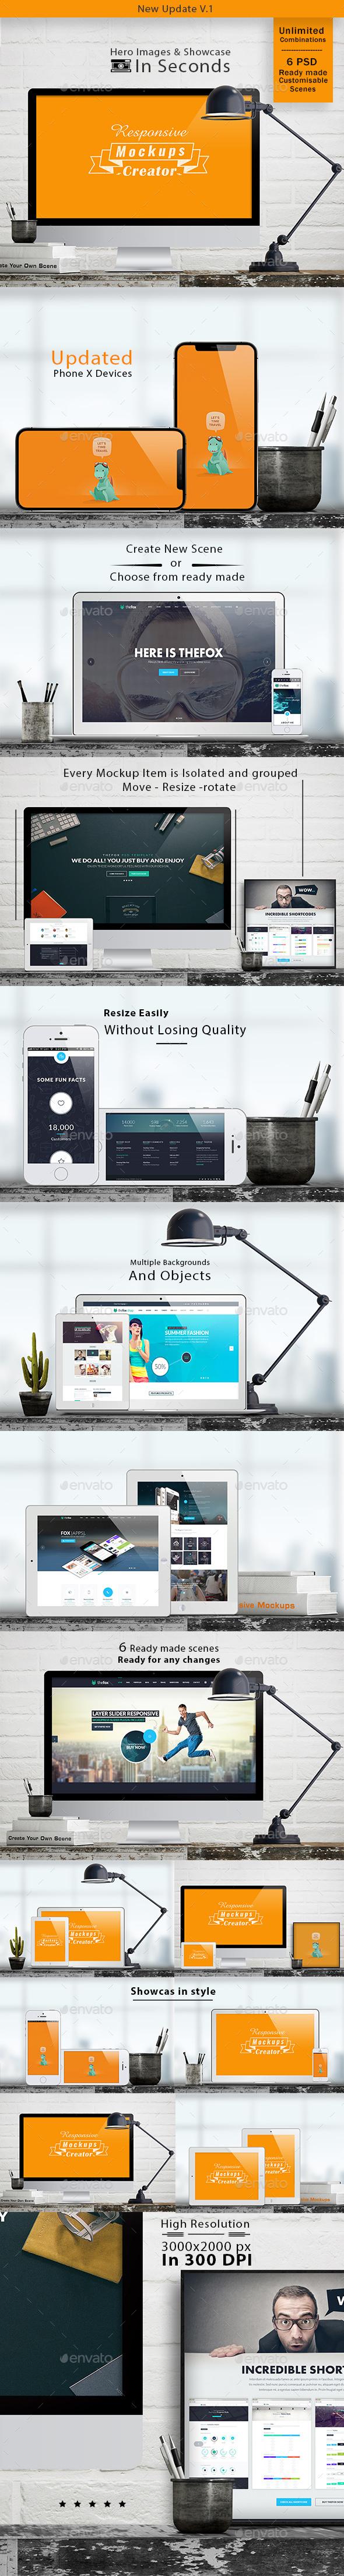 Responsive Mockups Creator - Showcase & Hero Images - Multiple Displays